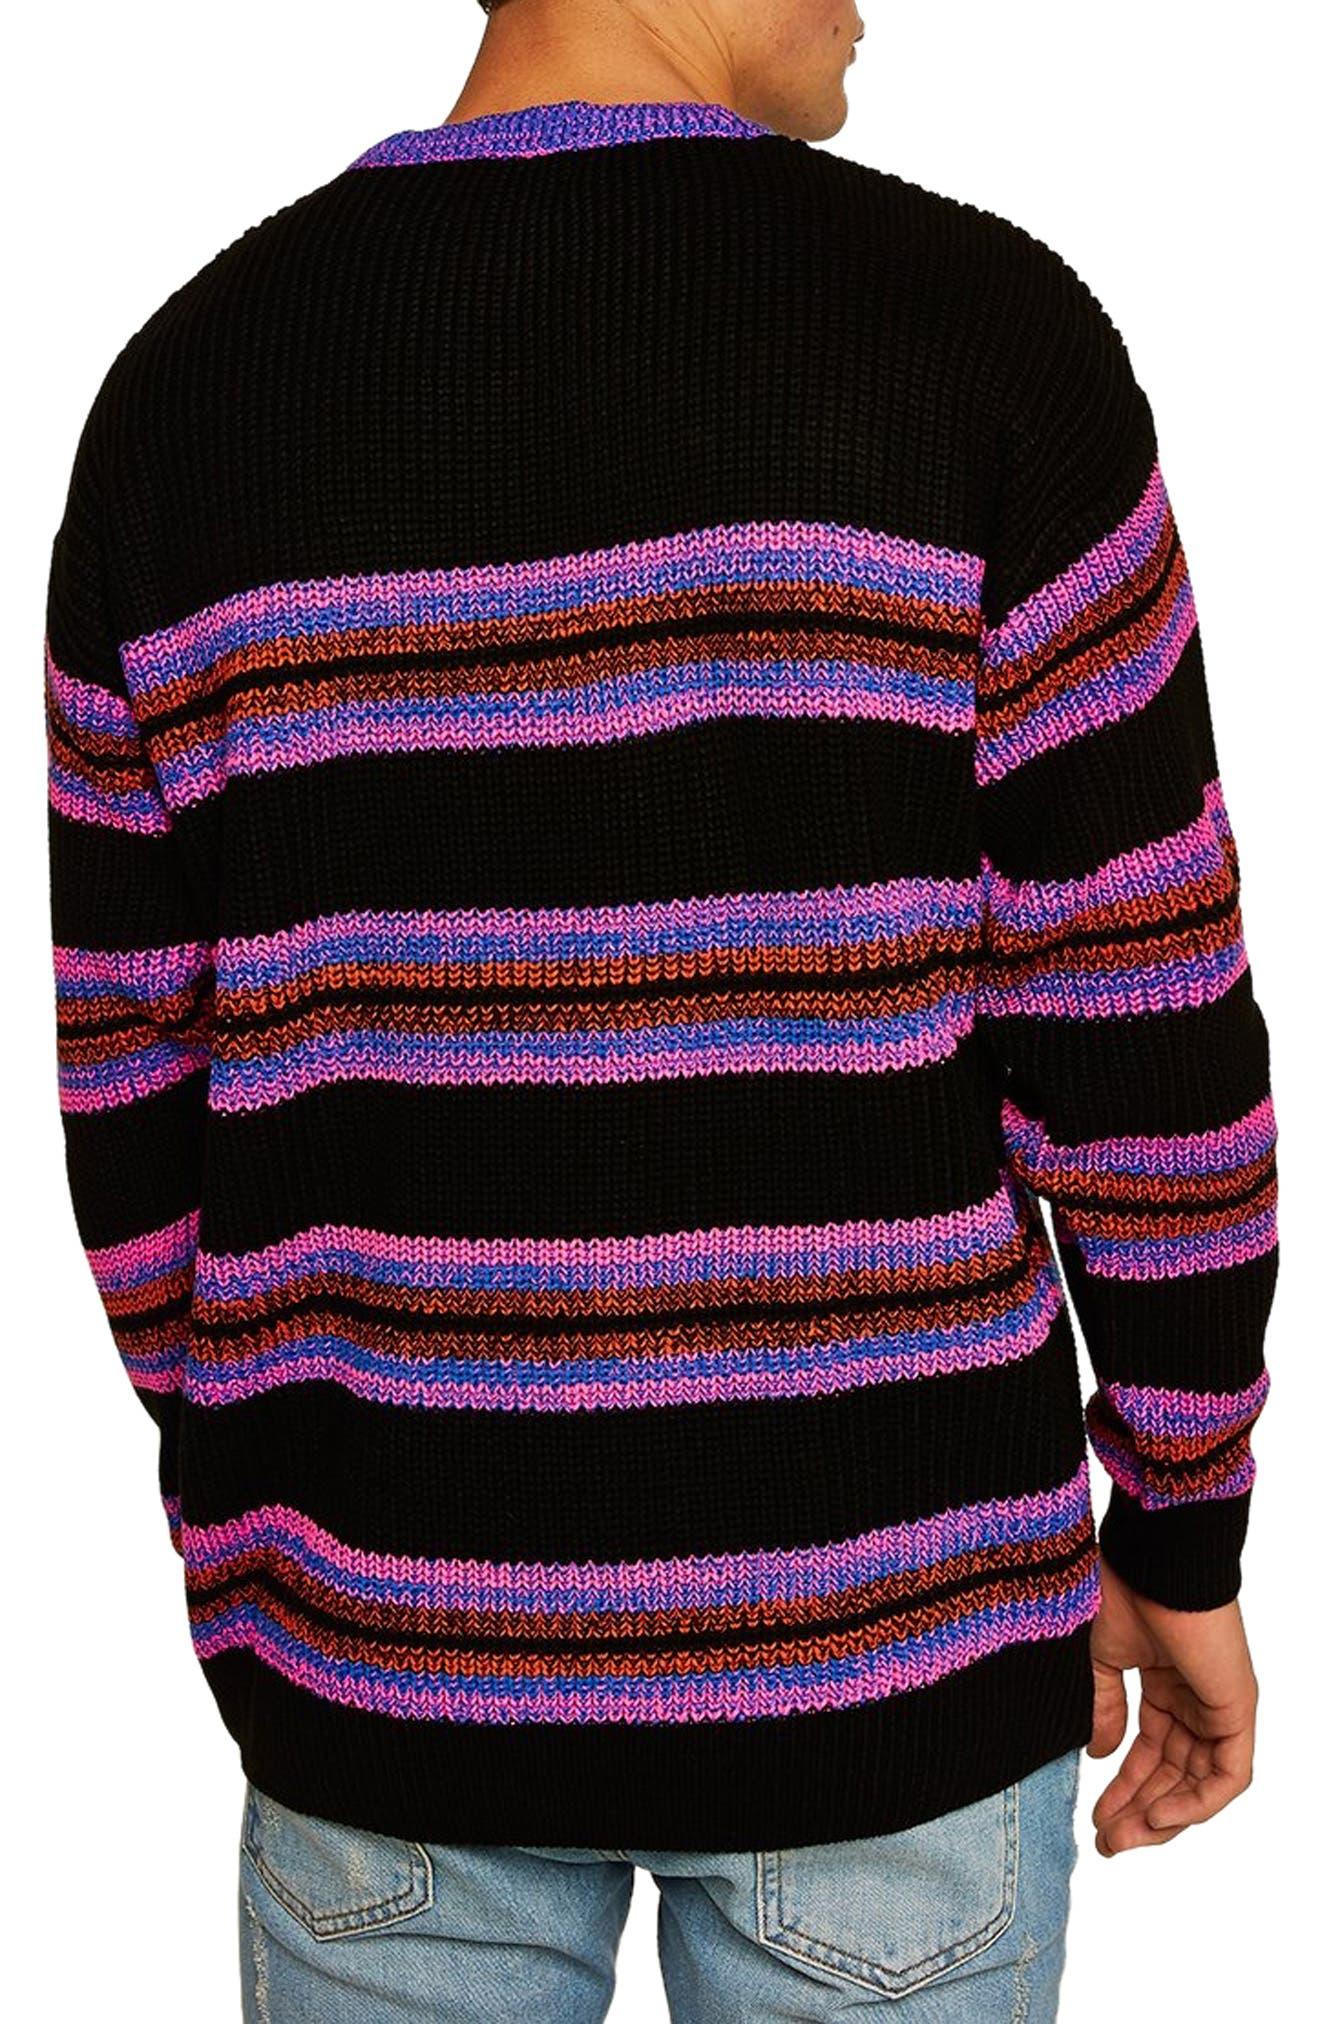 '90s Stripe Classic Fit Sweater,                             Alternate thumbnail 2, color,                             BLACK MULTI